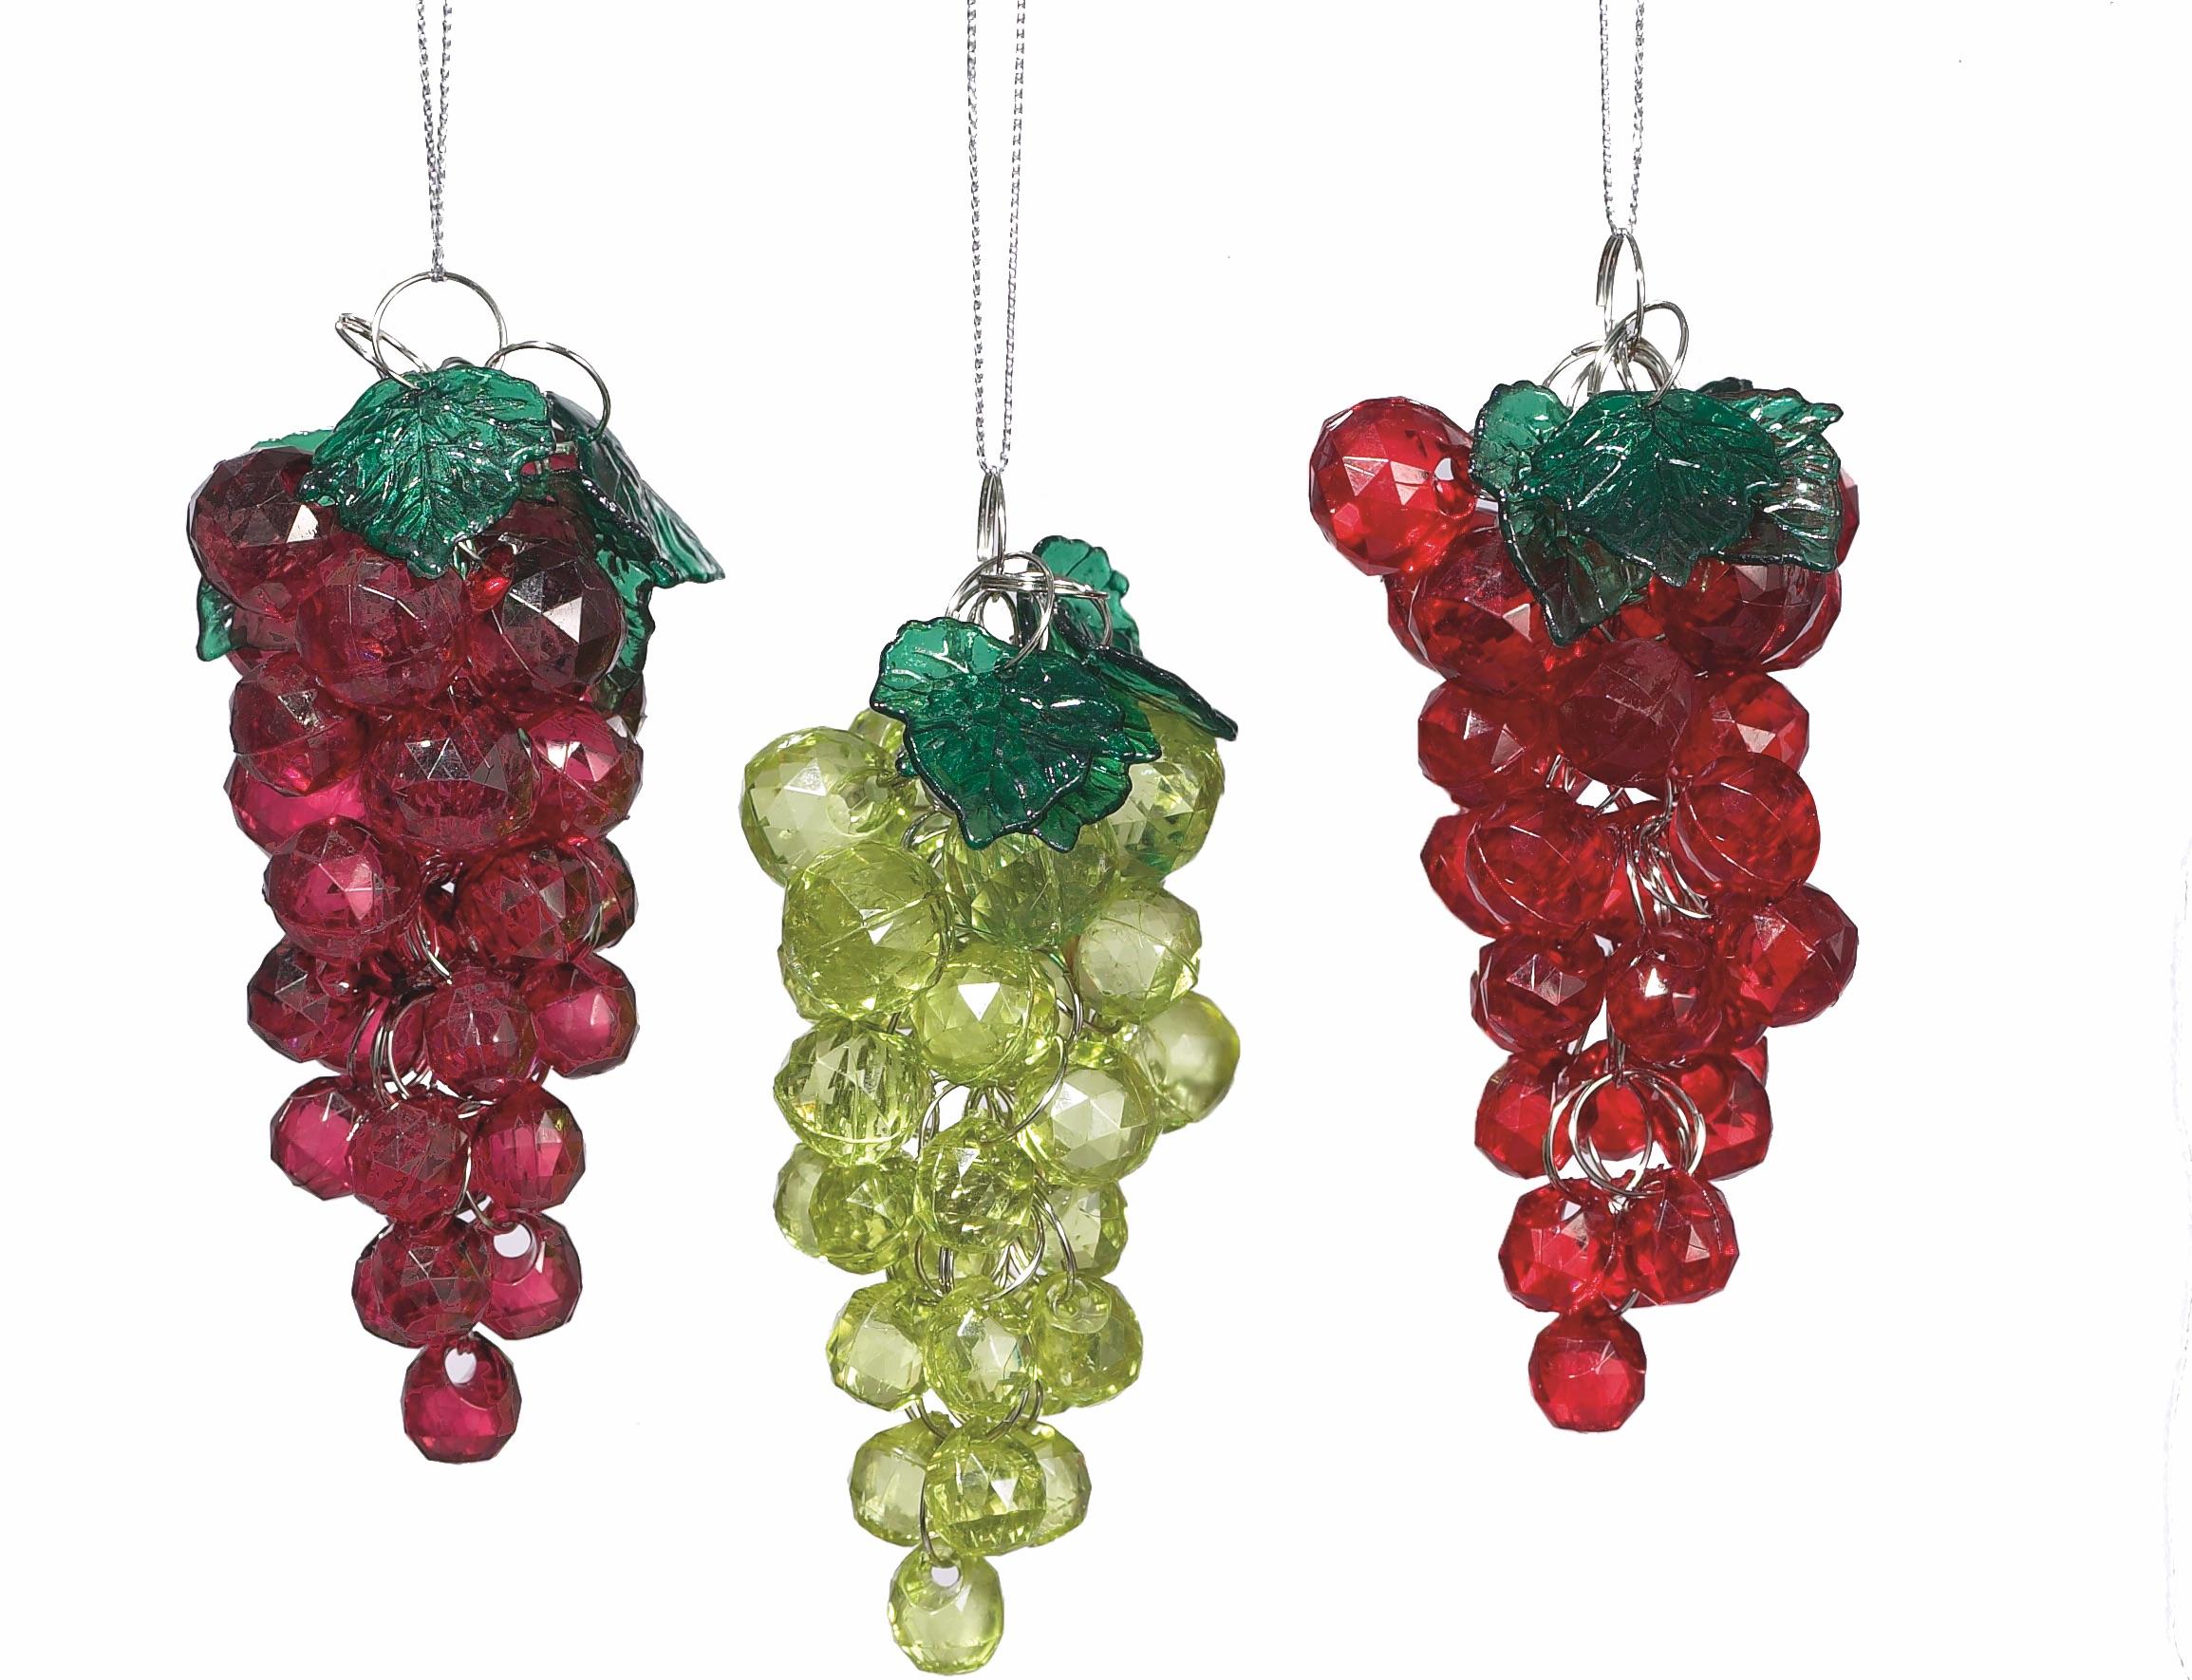 Ornament Wine kunststof h10 cm